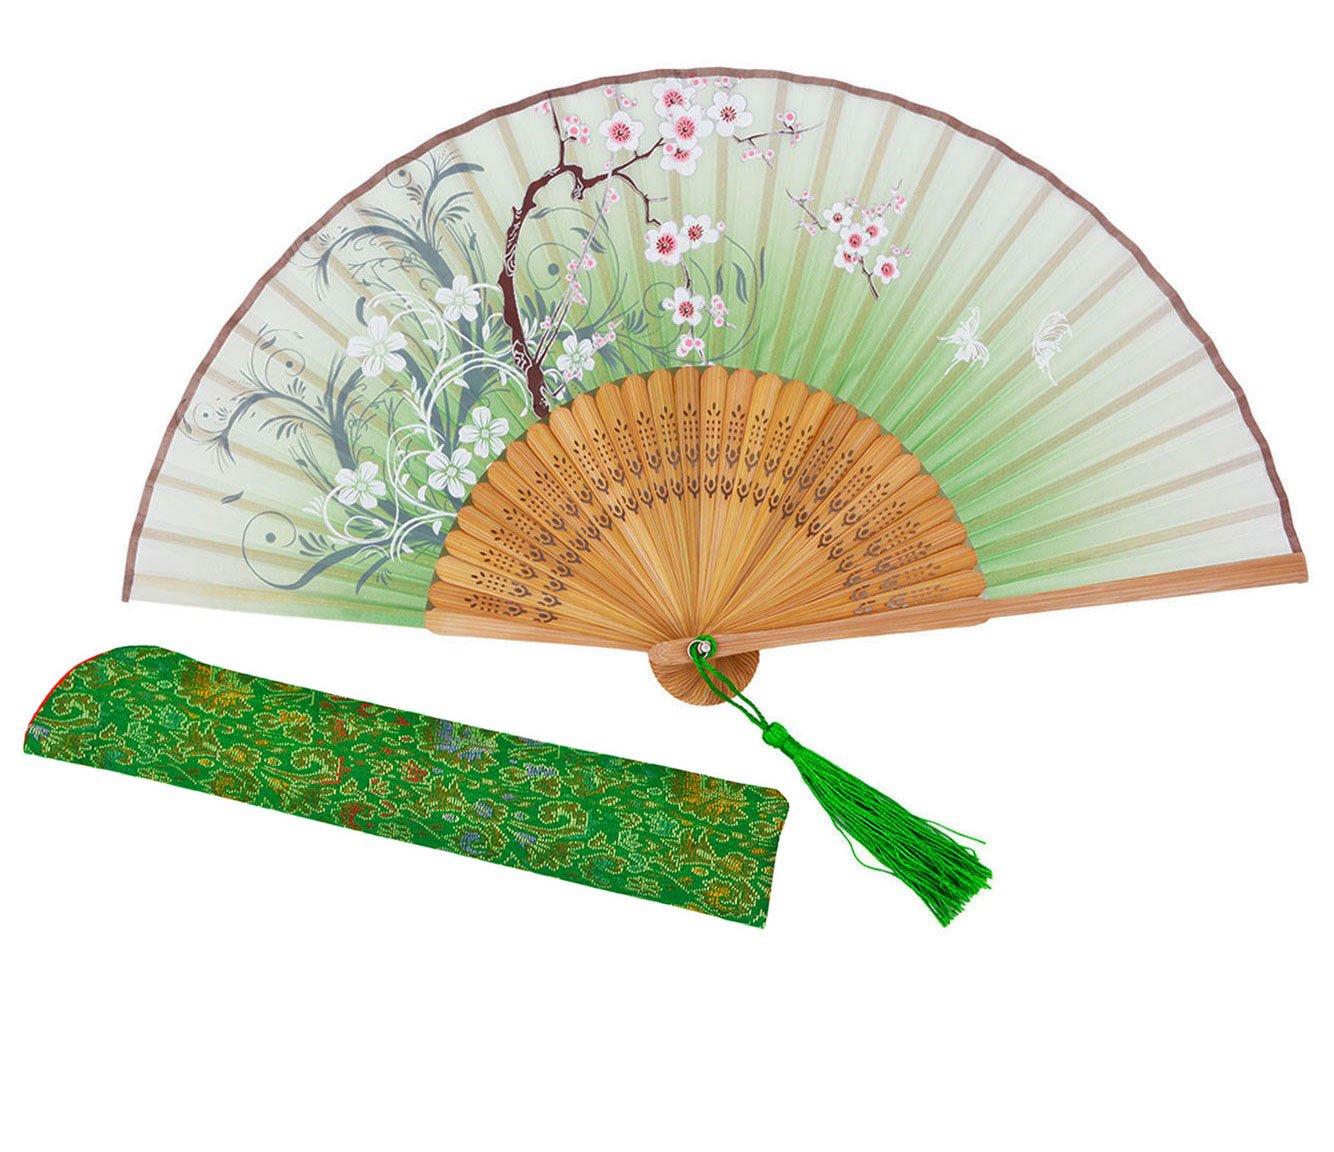 Meifan Chinese /Japanses Classical Handmade Vintage Folding Bamboo Silk Flower Pattern Hand Fan MFX (Green)